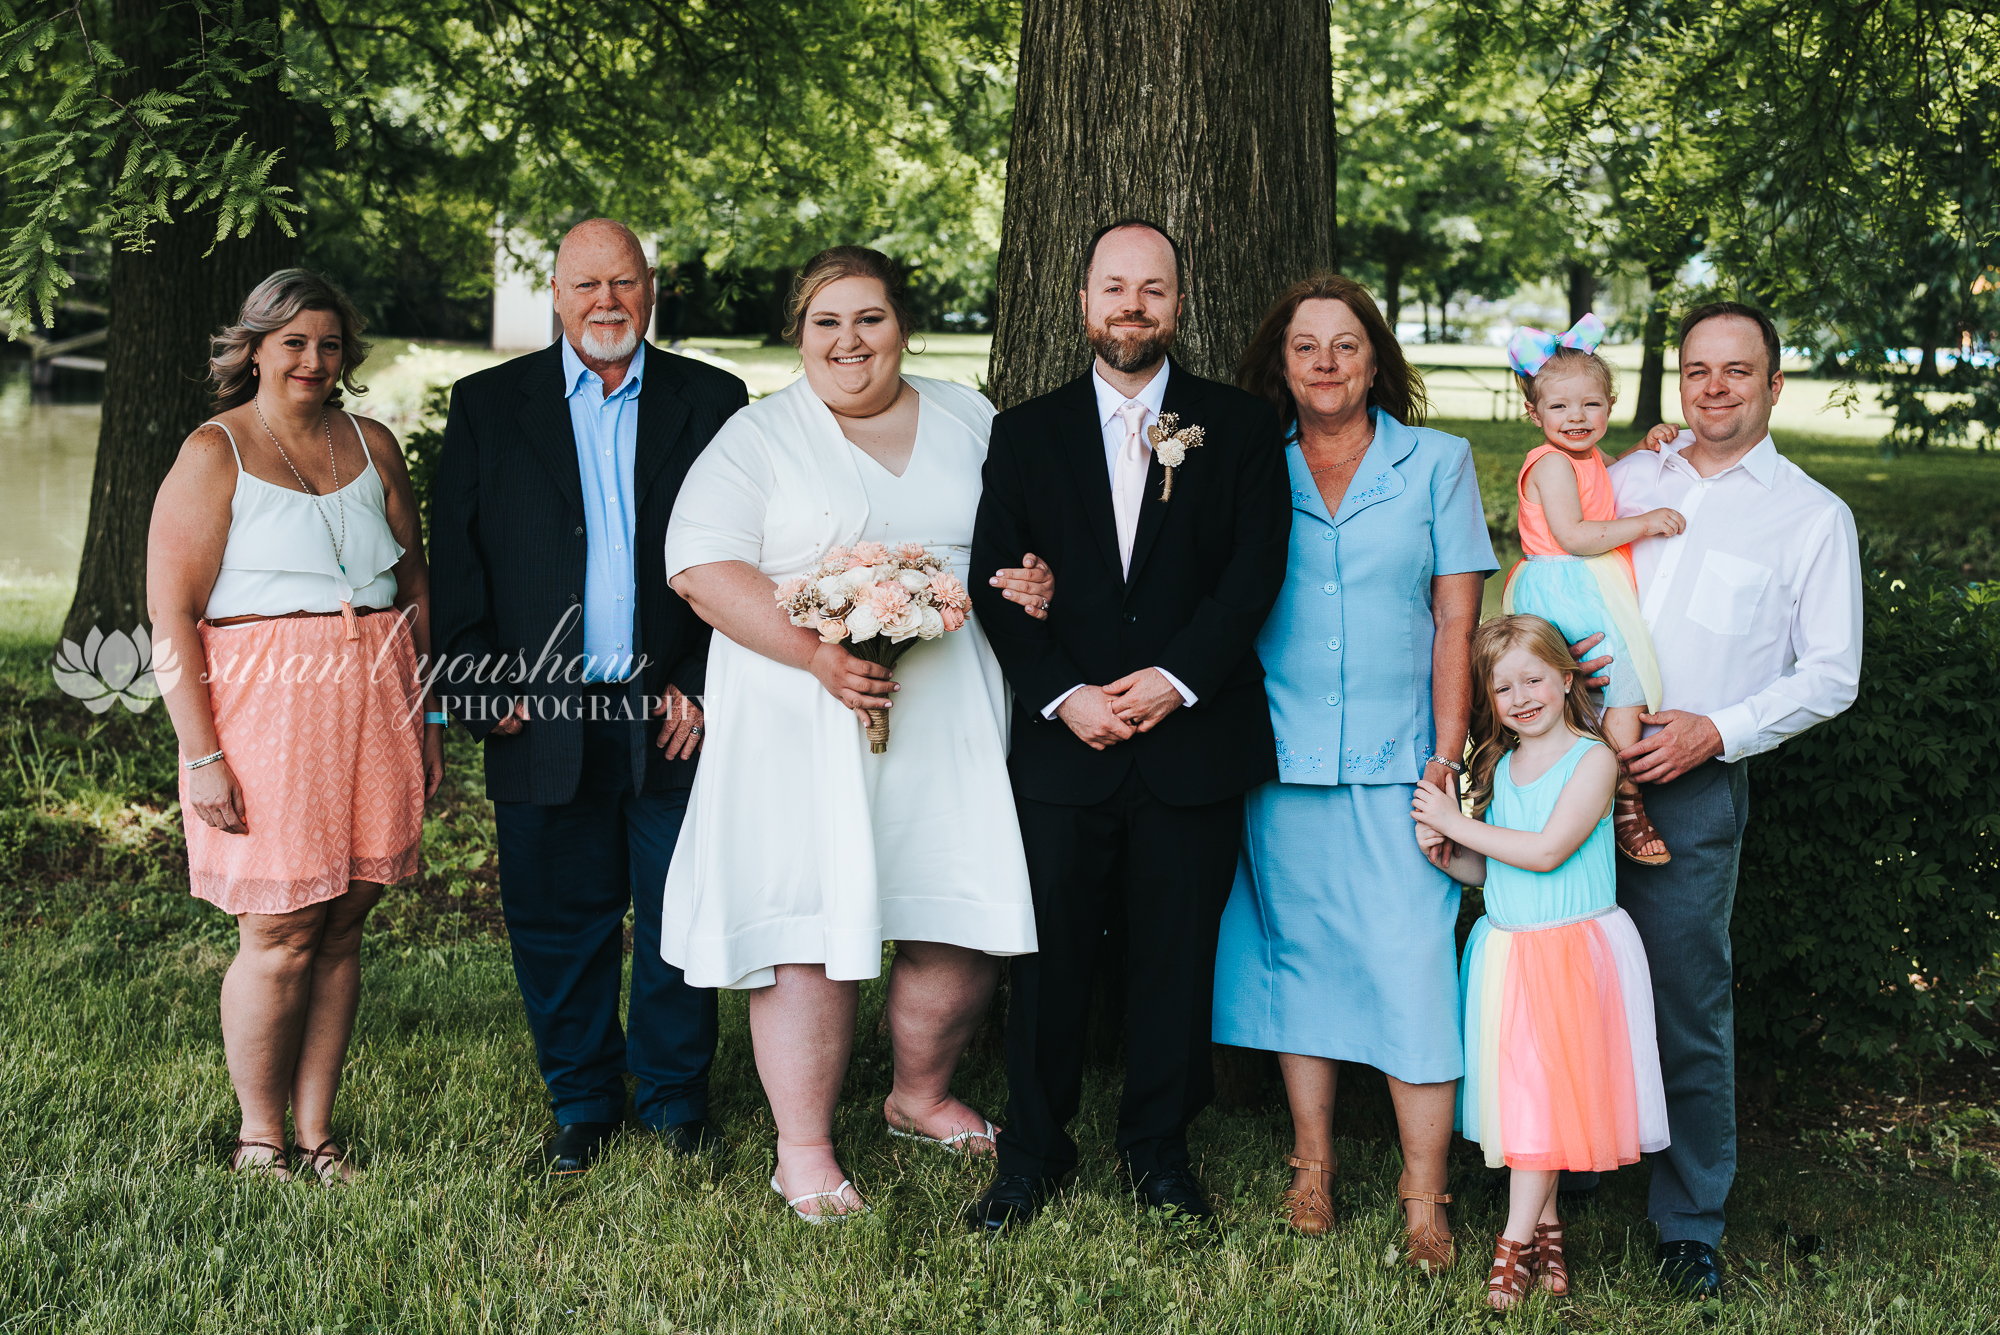 Bill and Sarah Wedding Photos 06-08-2019 SLY Photography -41.jpg